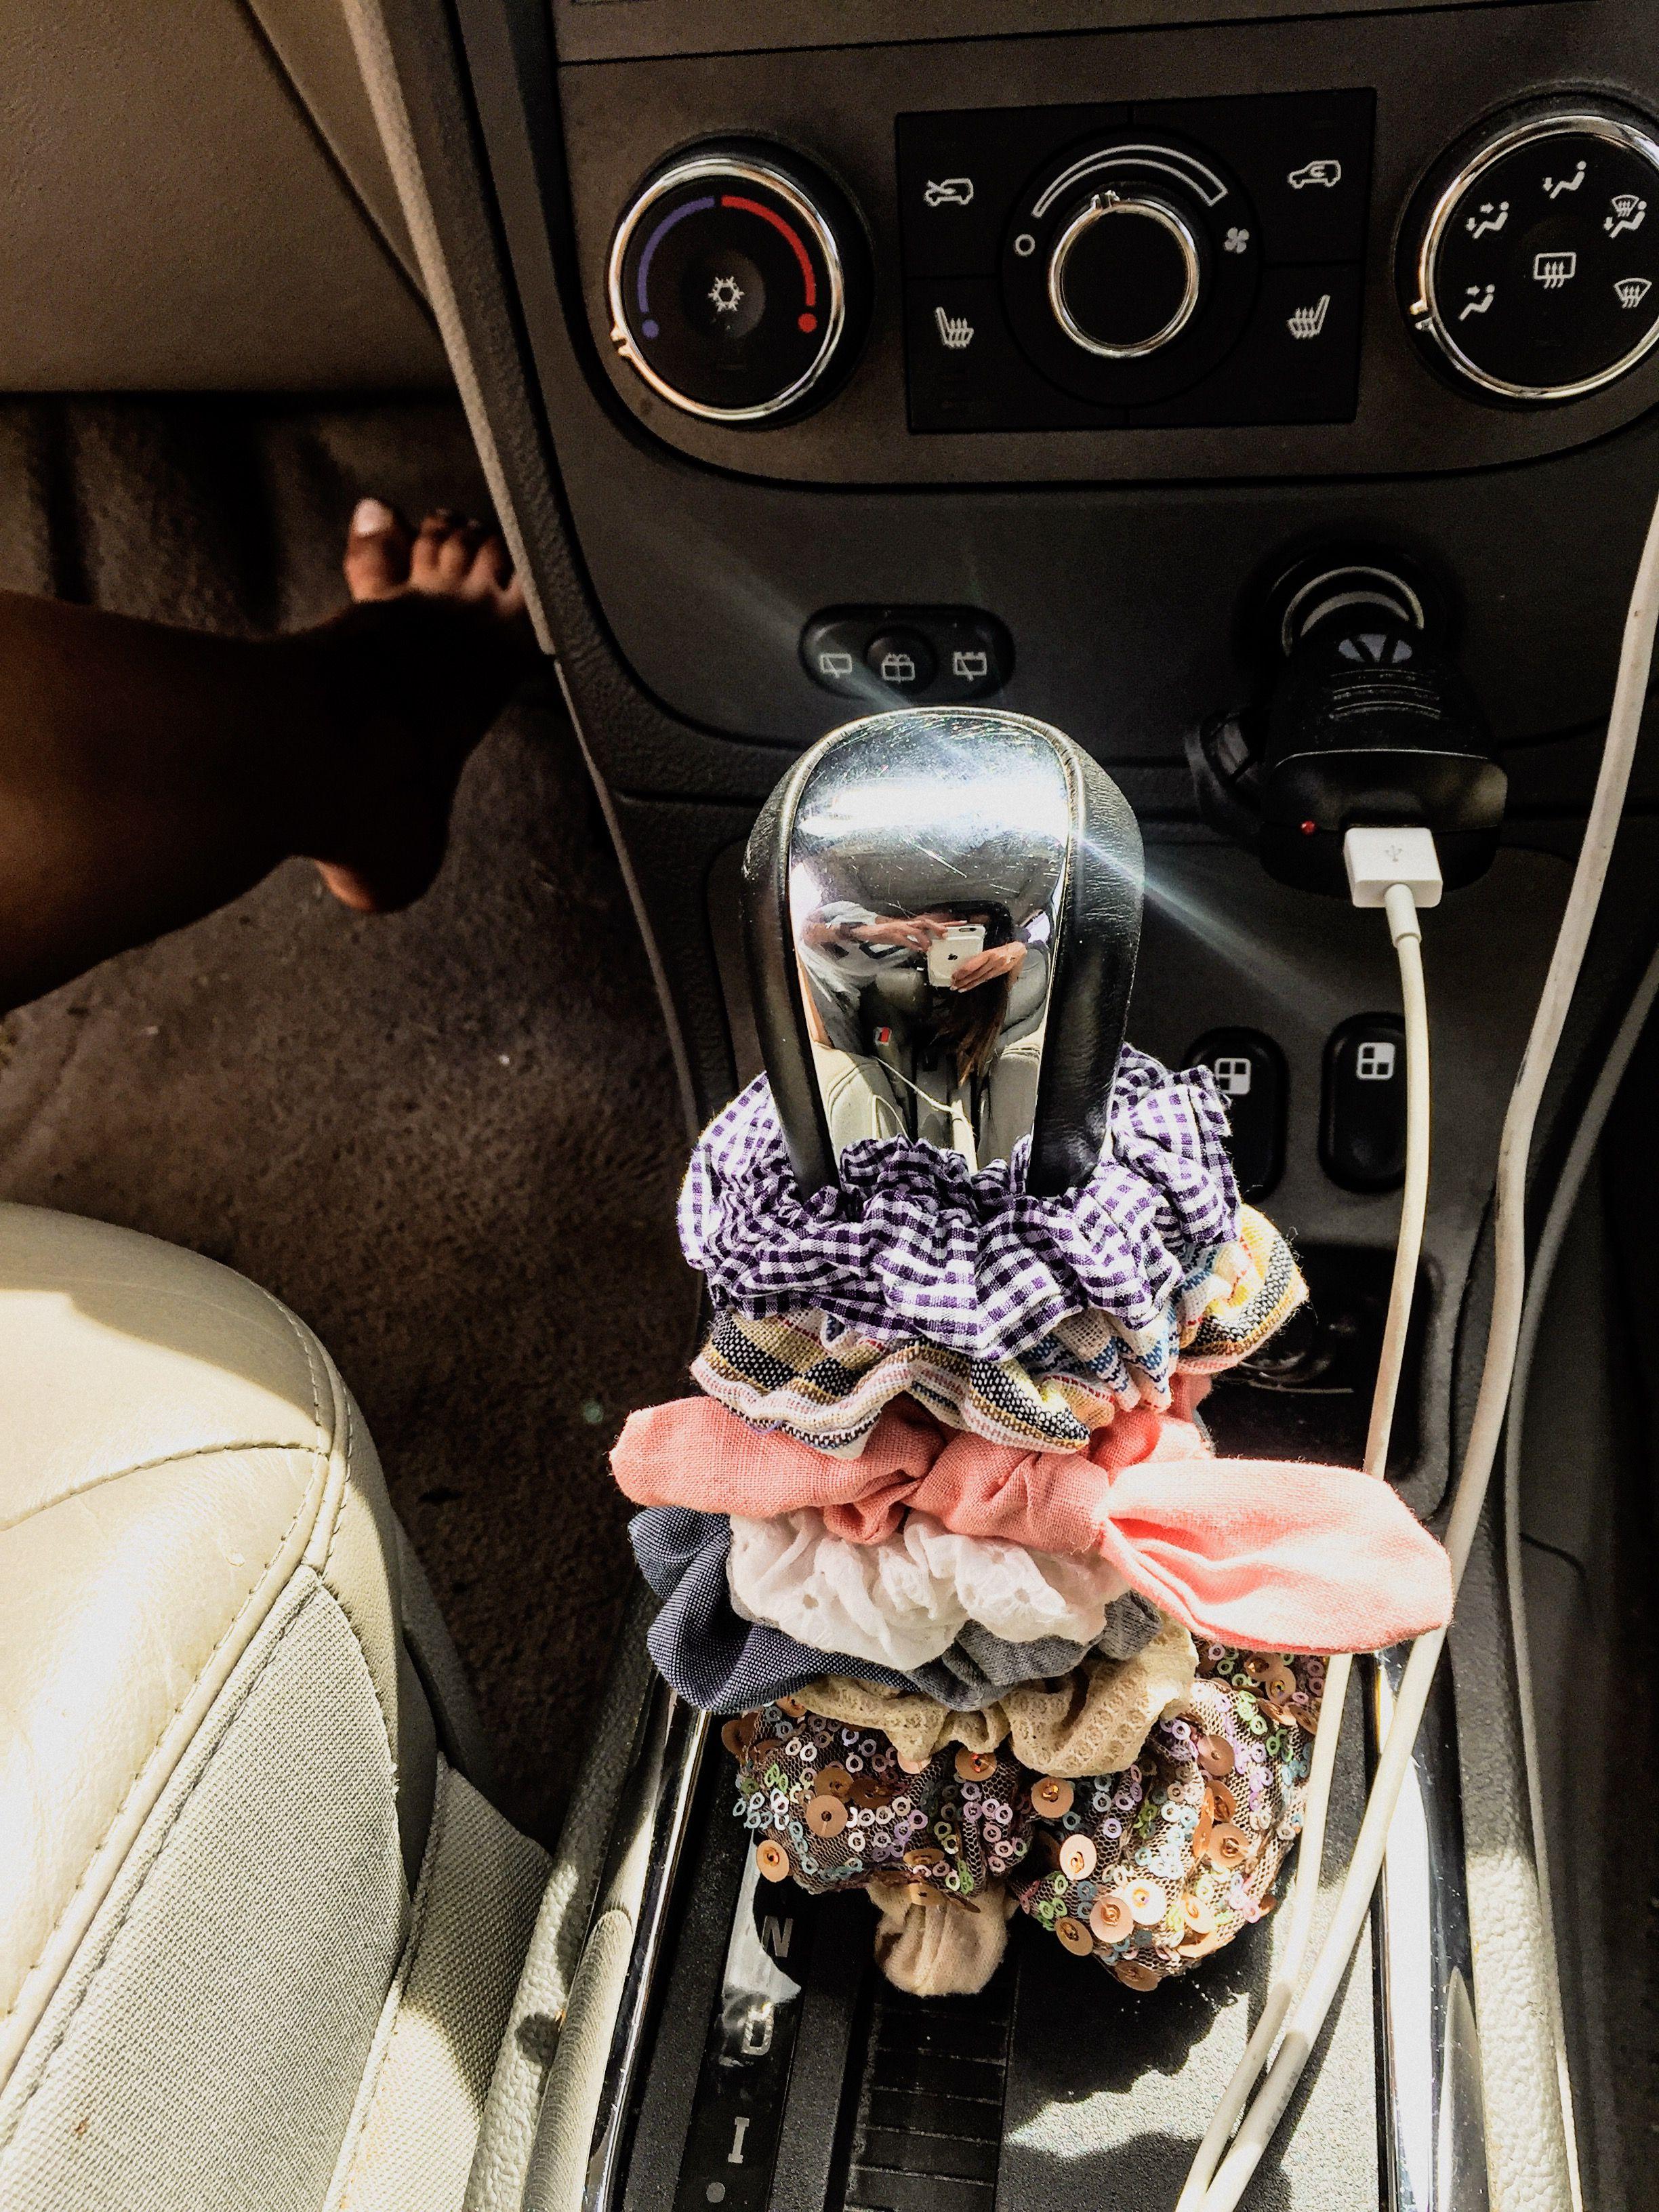 Chevy Hhr Interior Scrunch Love And Decor Chevy